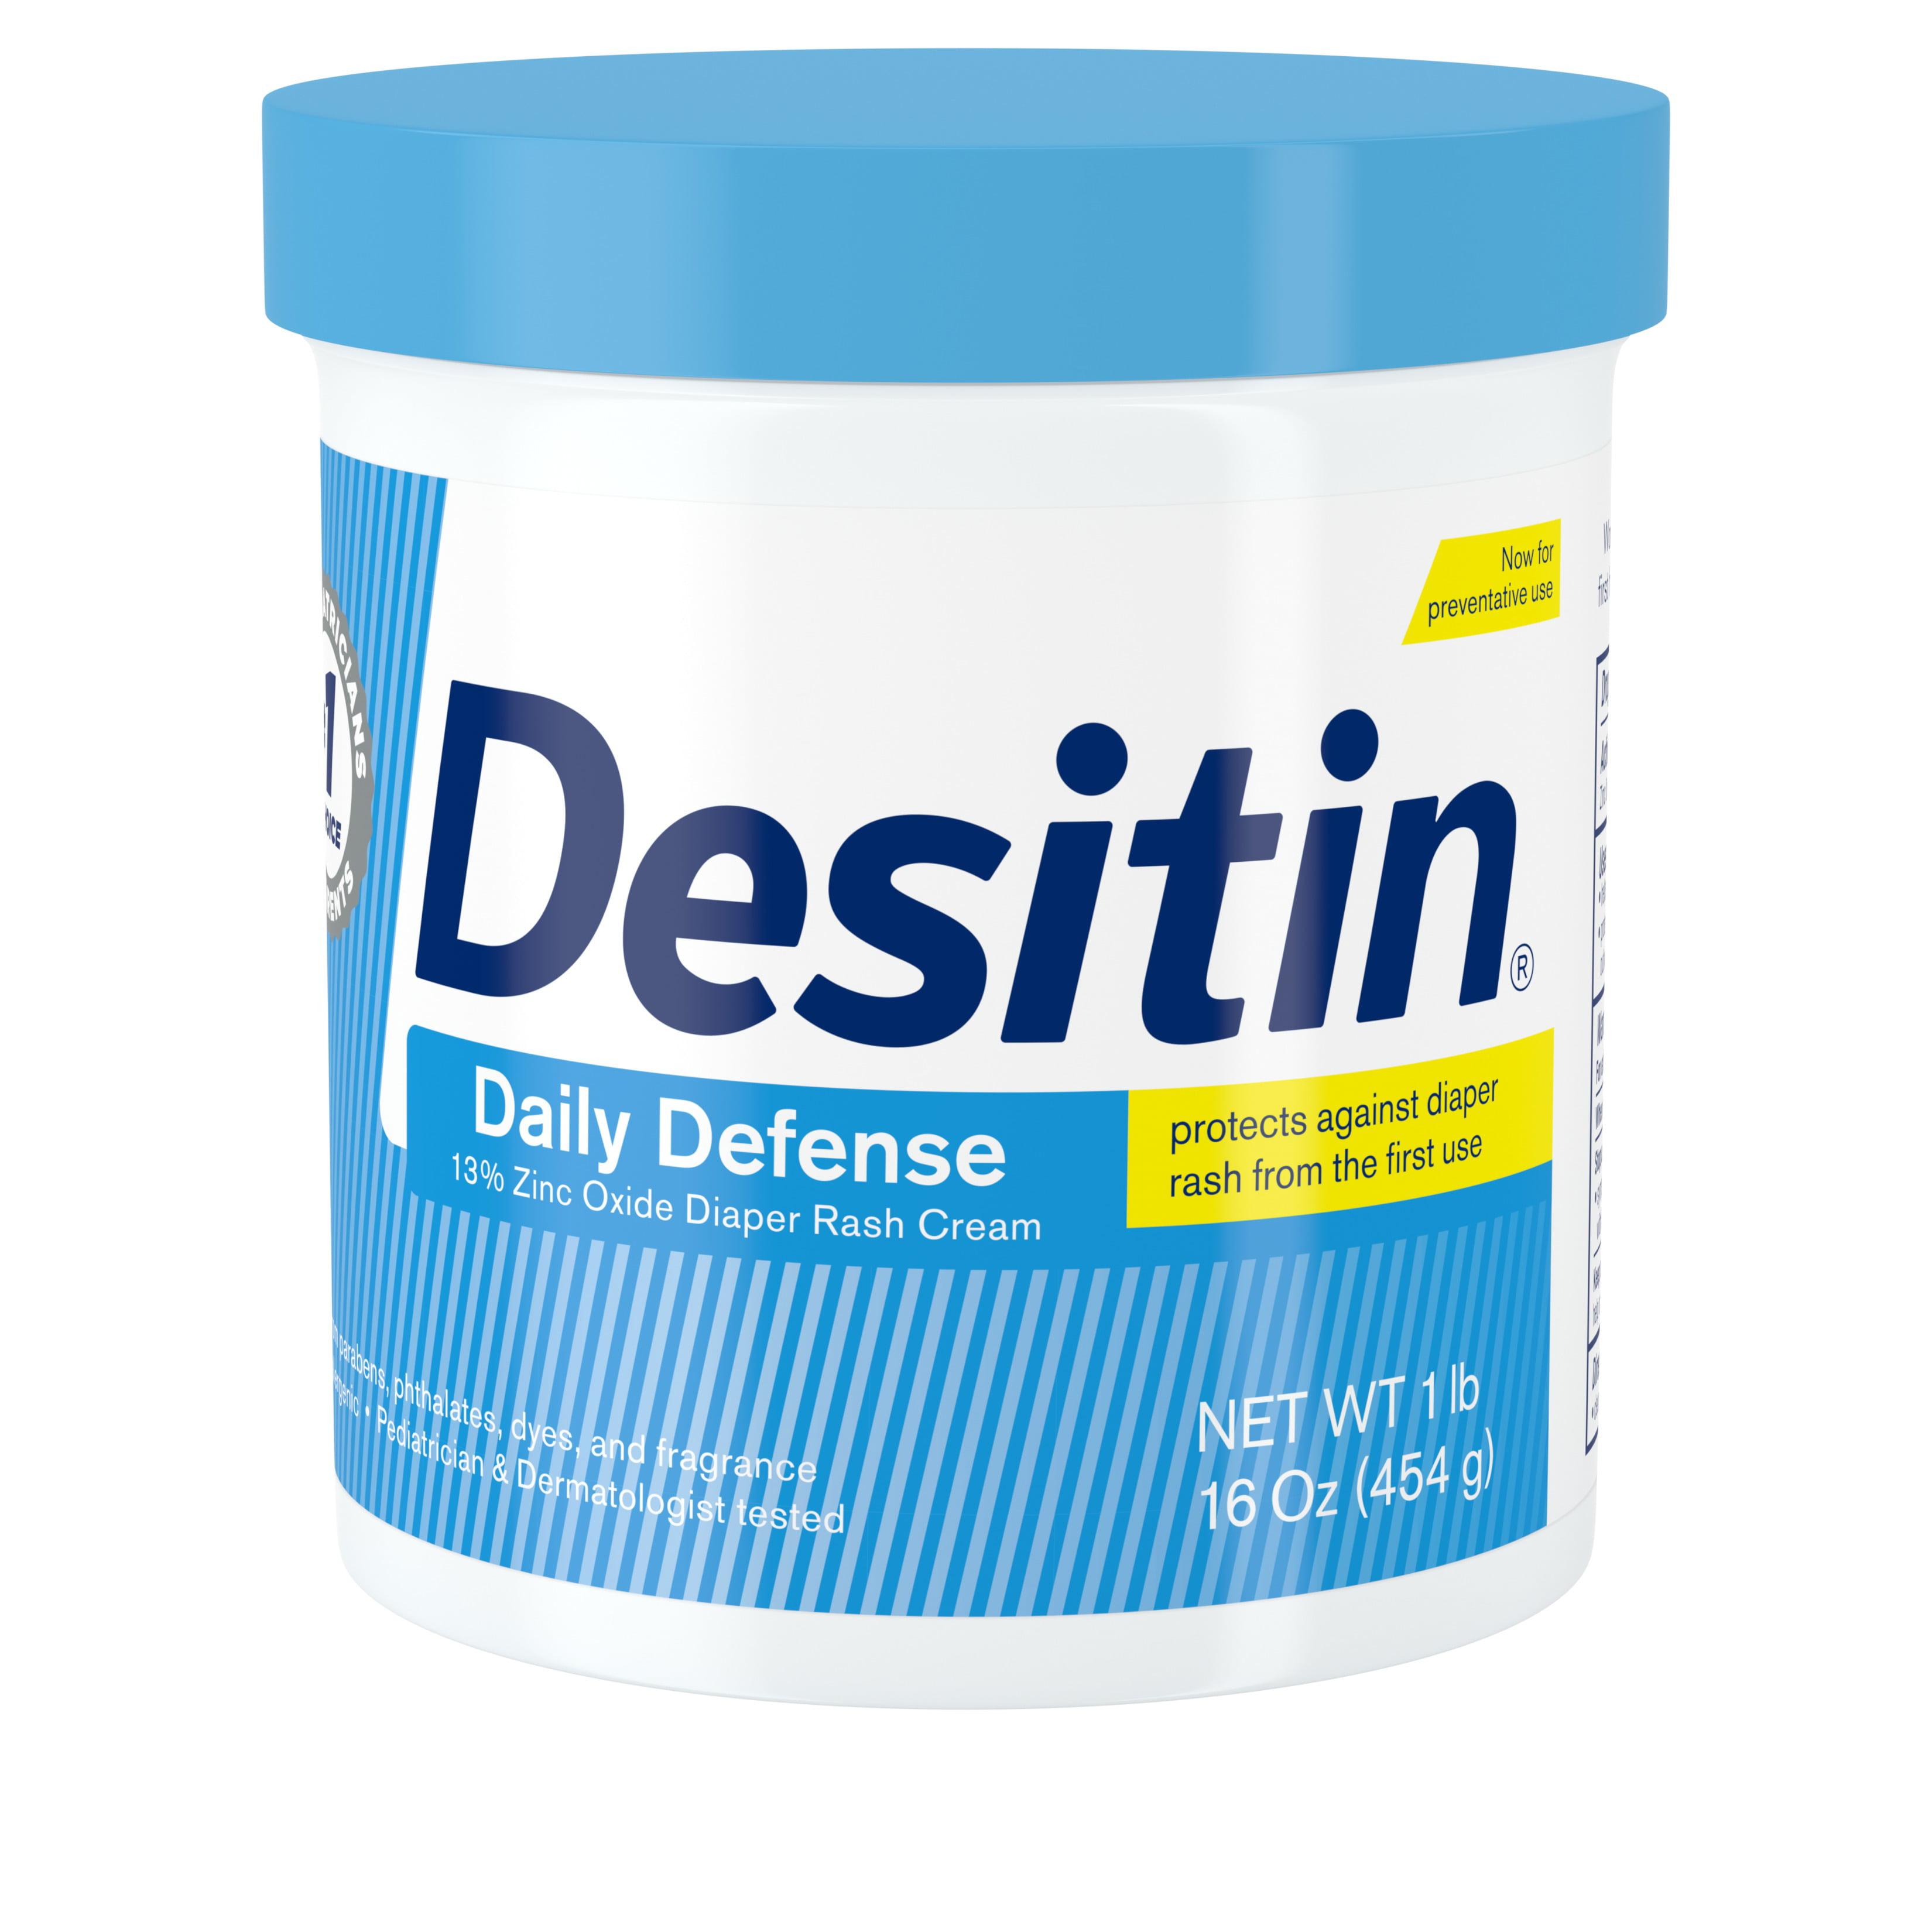 Desitin Daily Defense Baby Diaper Rash Cream With Zinc